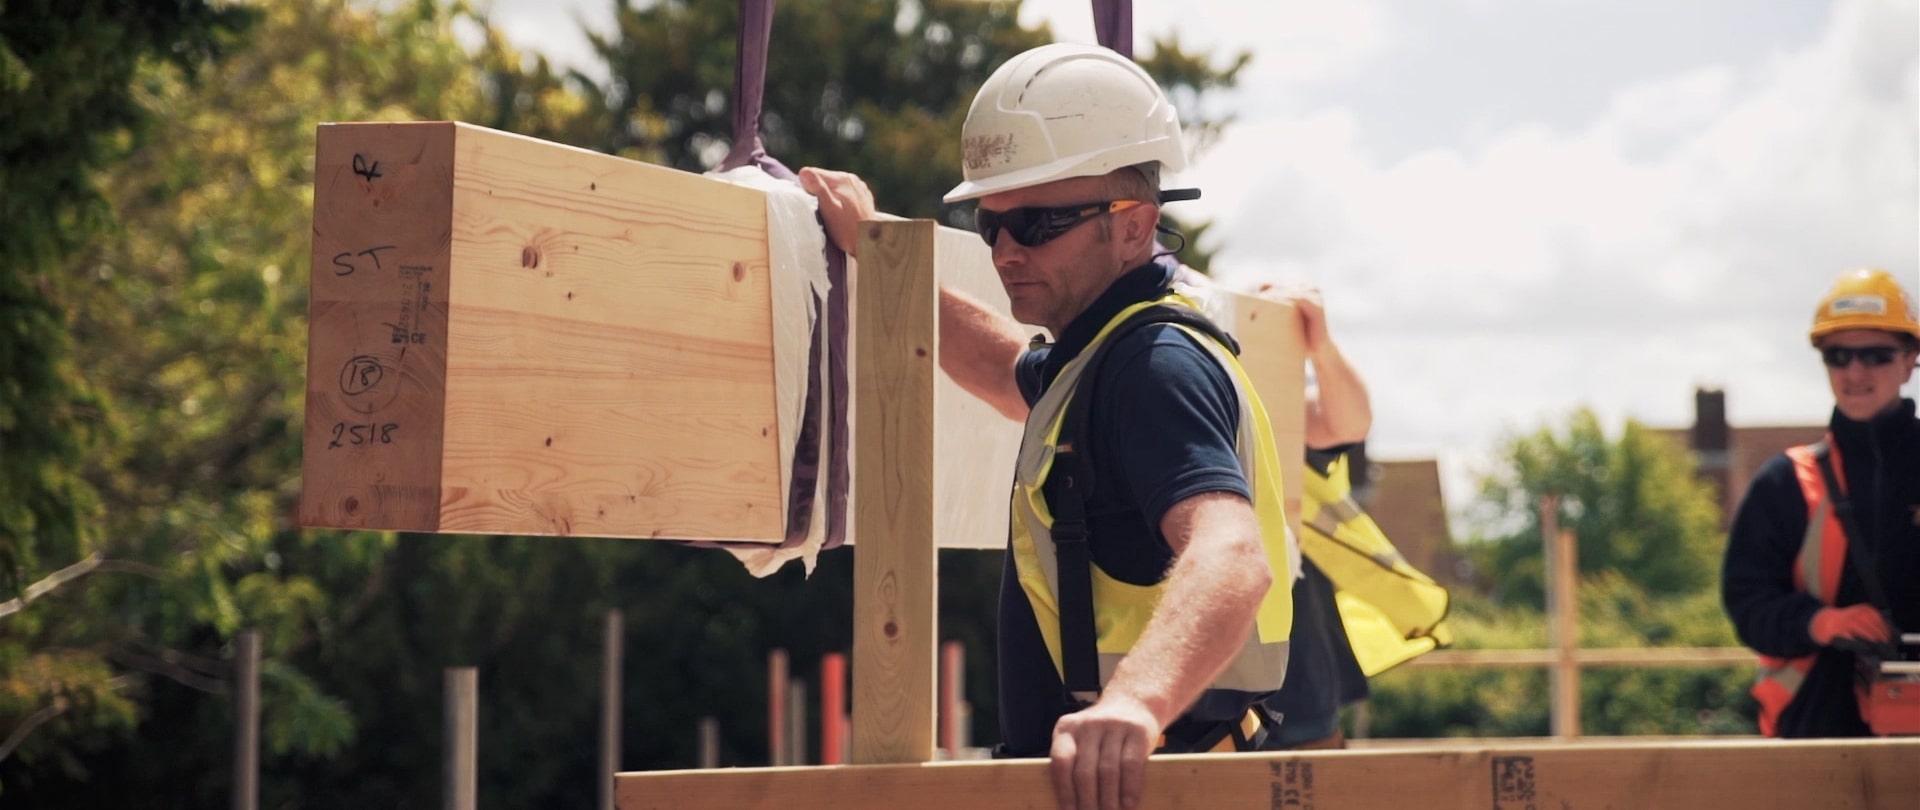 Scotts of Thrapston Timber Engineering